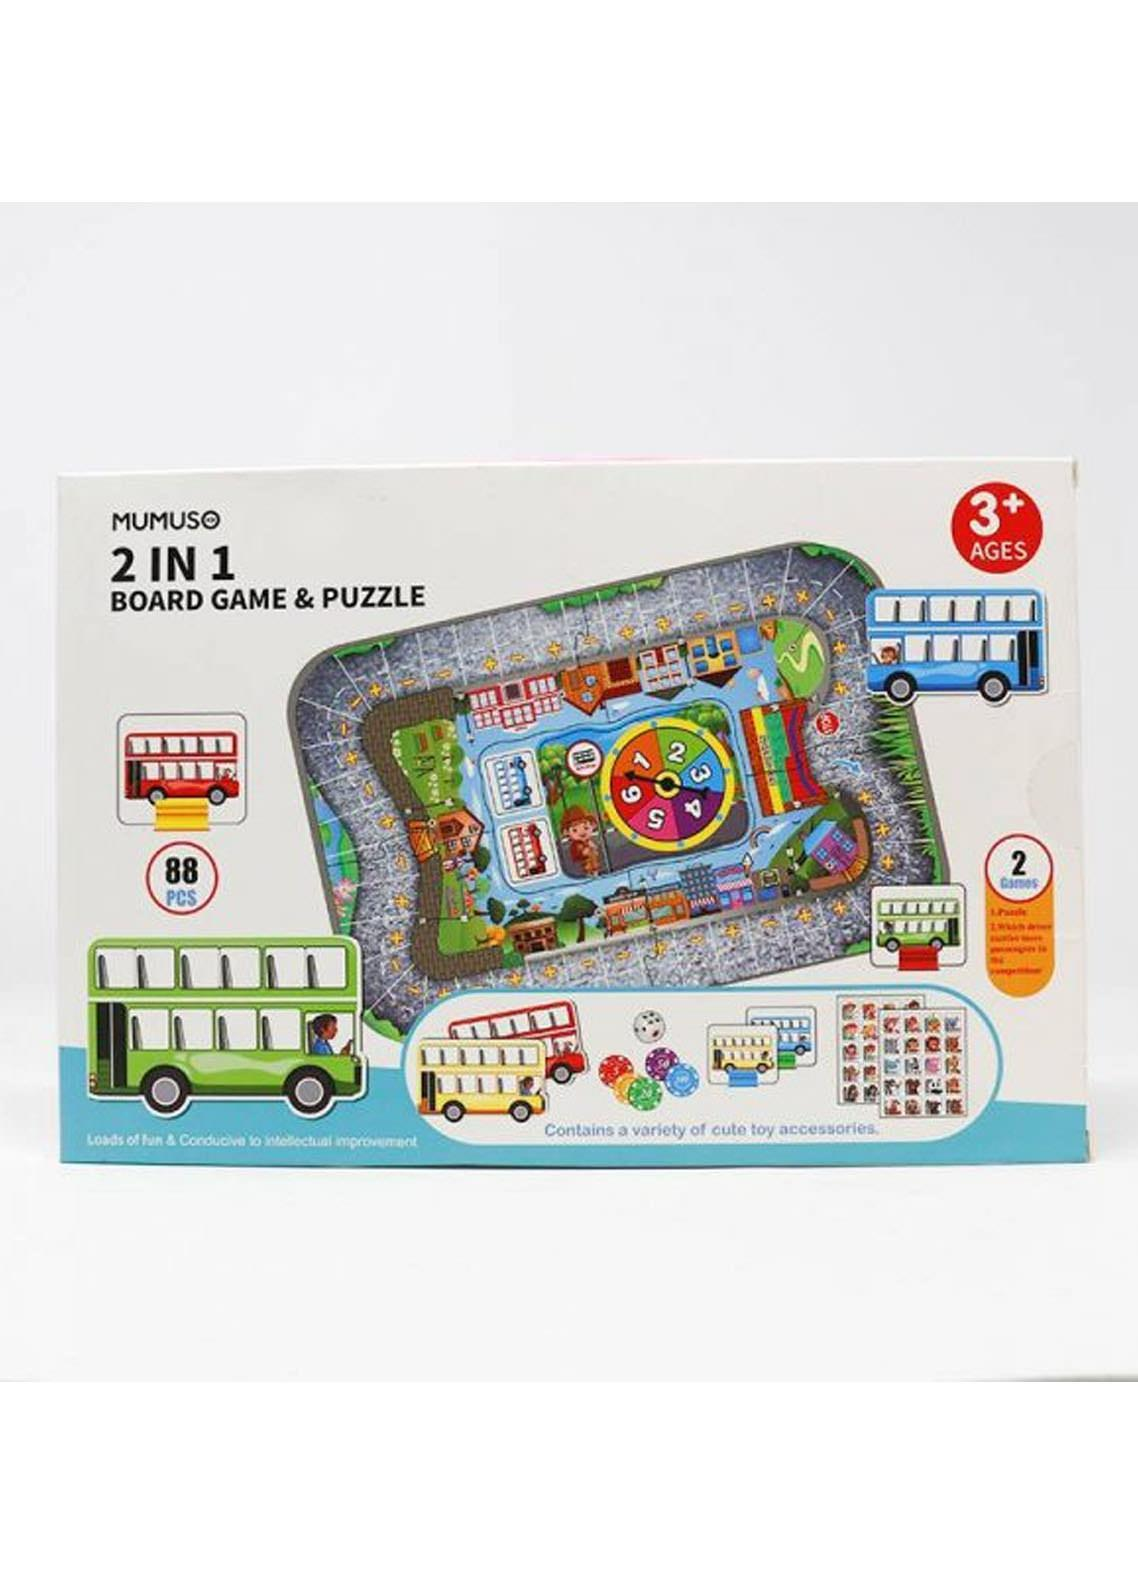 Mumuso 2 in 1 Board Game & Puzzle